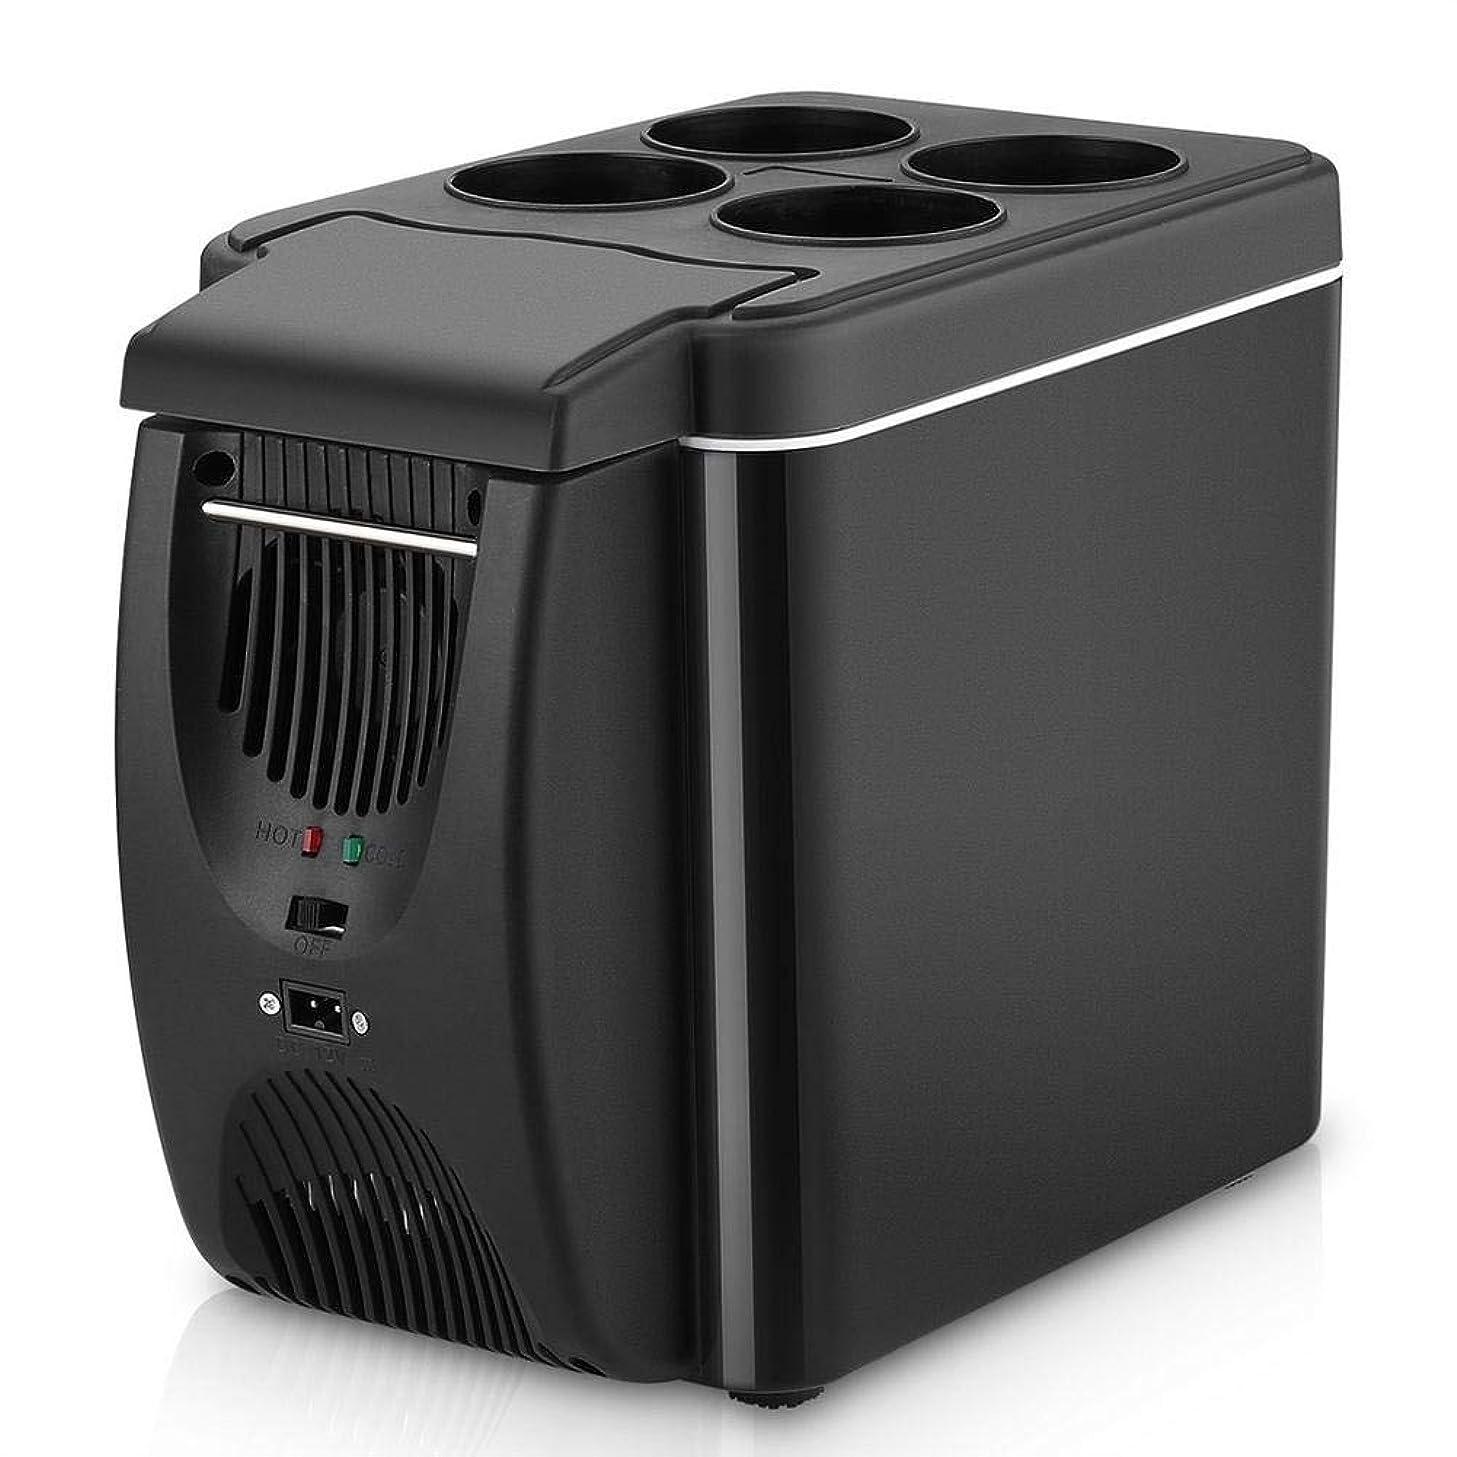 nattiness 12V Portable Electric Cooler/Warmer for Car, 6L Mini Car Freezer Cooler & Warmer, Electric Fridge Portable Icebox Travel Refrigerator - Food Heater Beverage Cooler Fridge